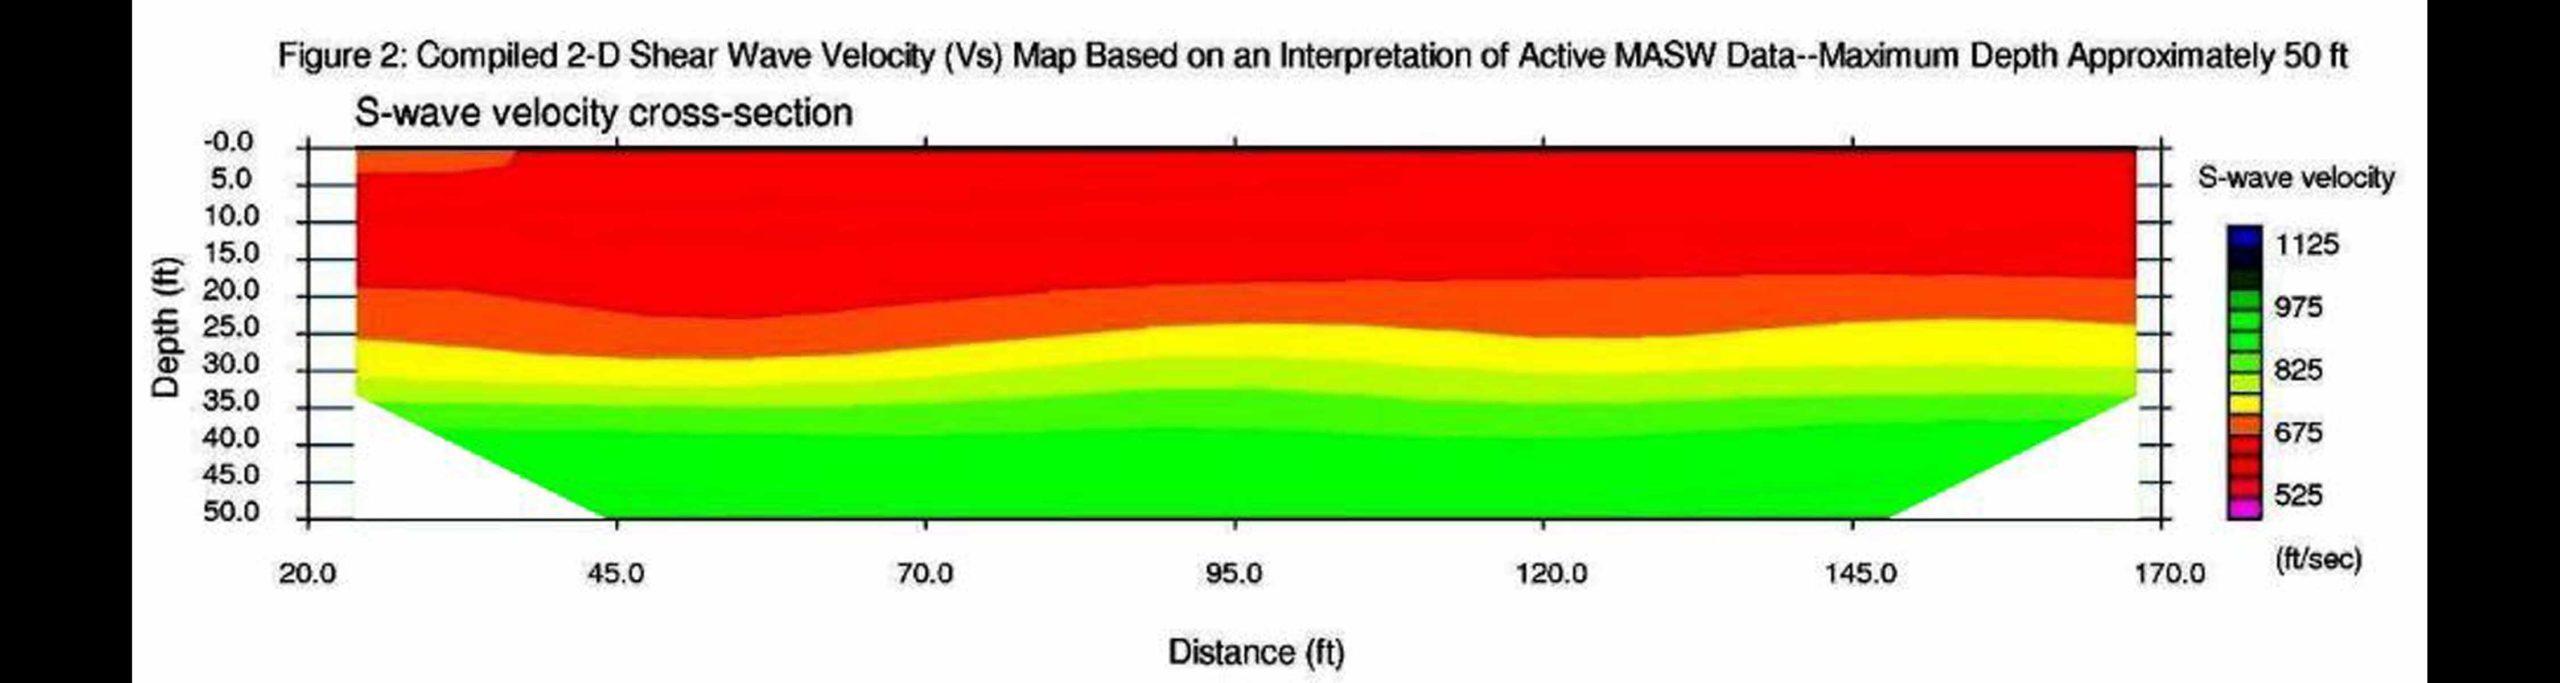 MASW Seismic Cross-Section